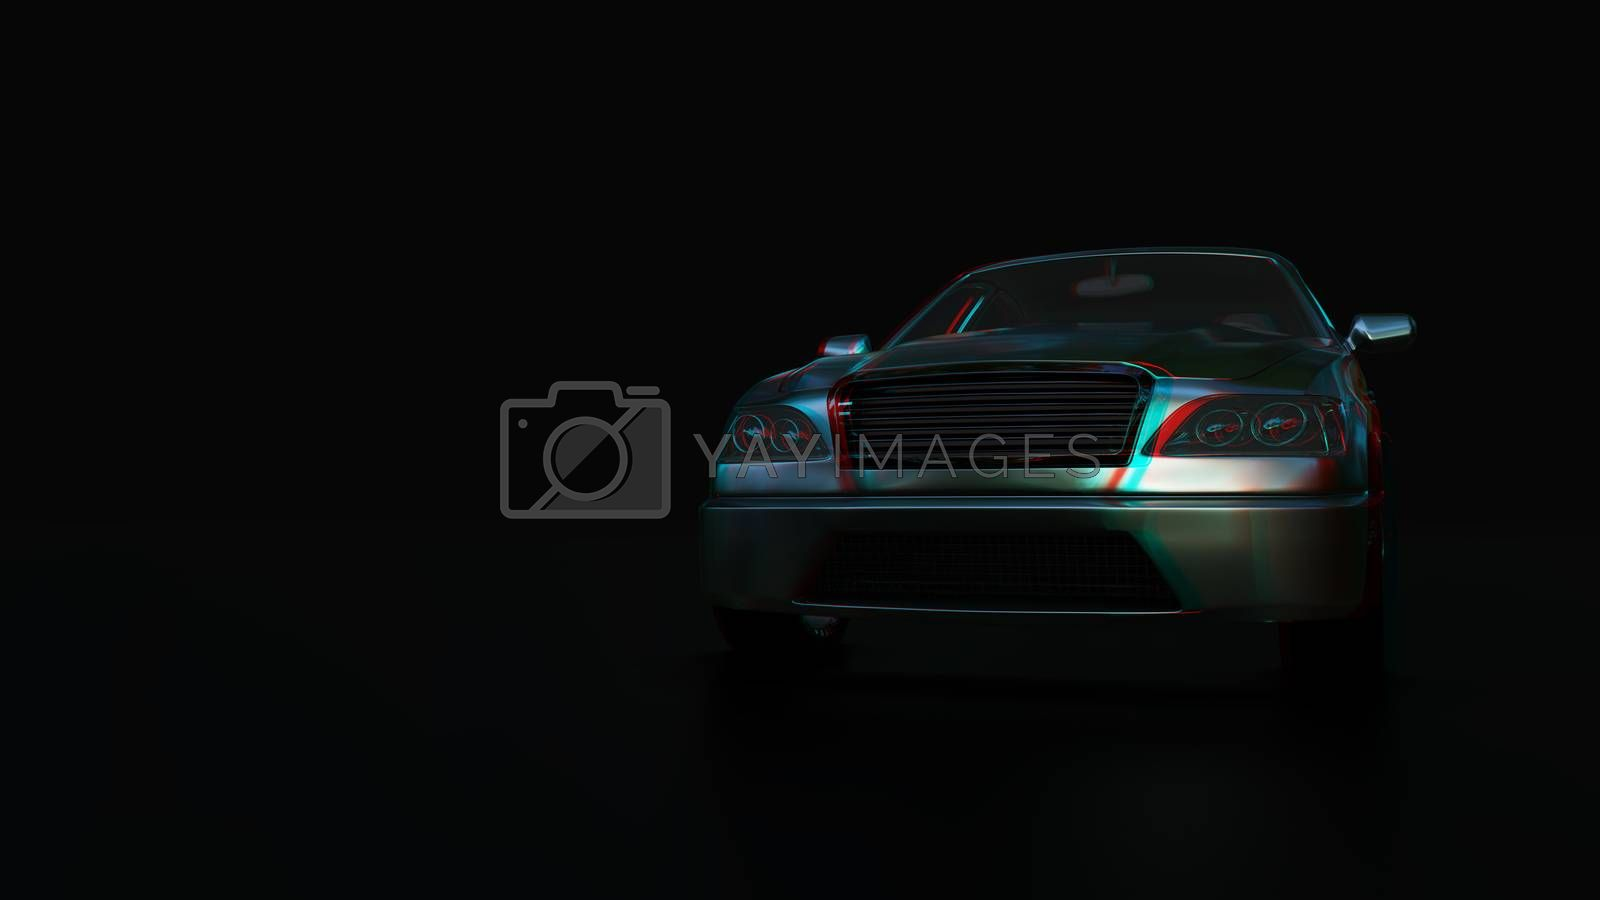 Modern sedan car on the dark background by cherezoff